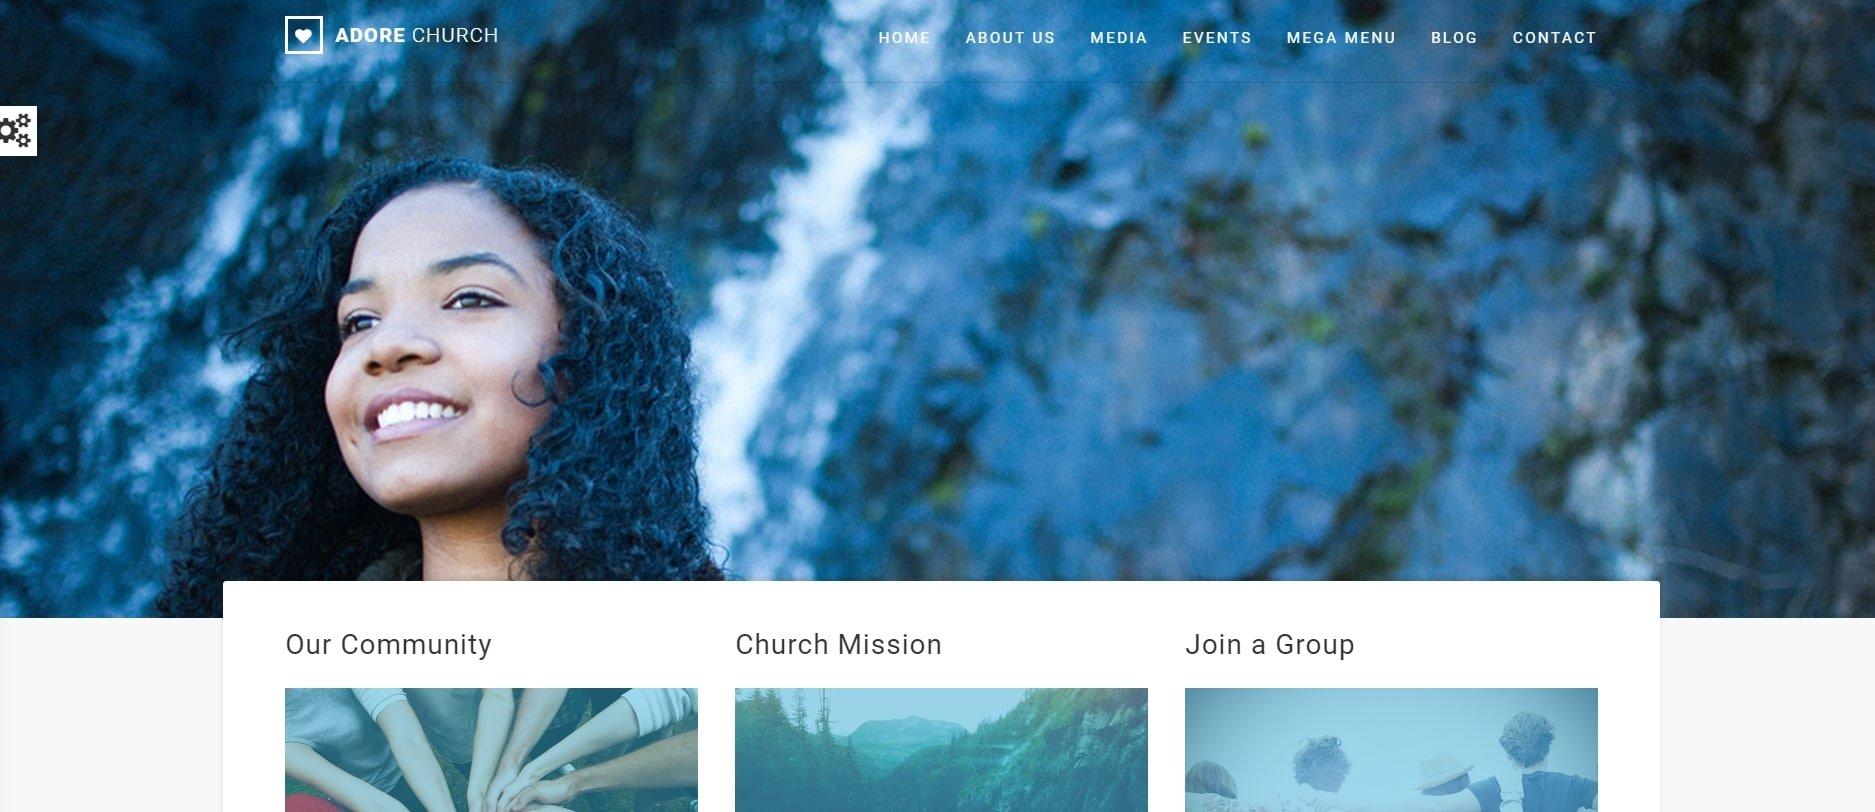 AdoreChurch - Church web template